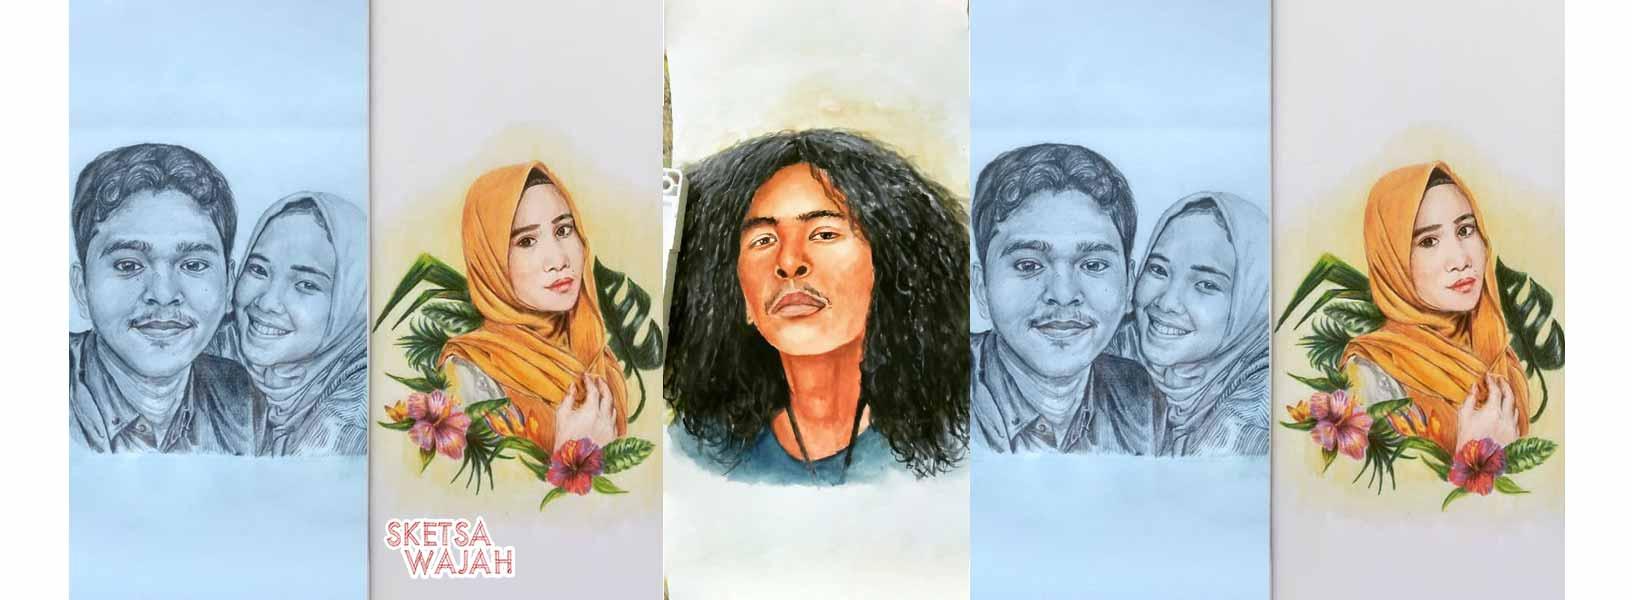 Karya Febridho sketcher Sketsa Wajah